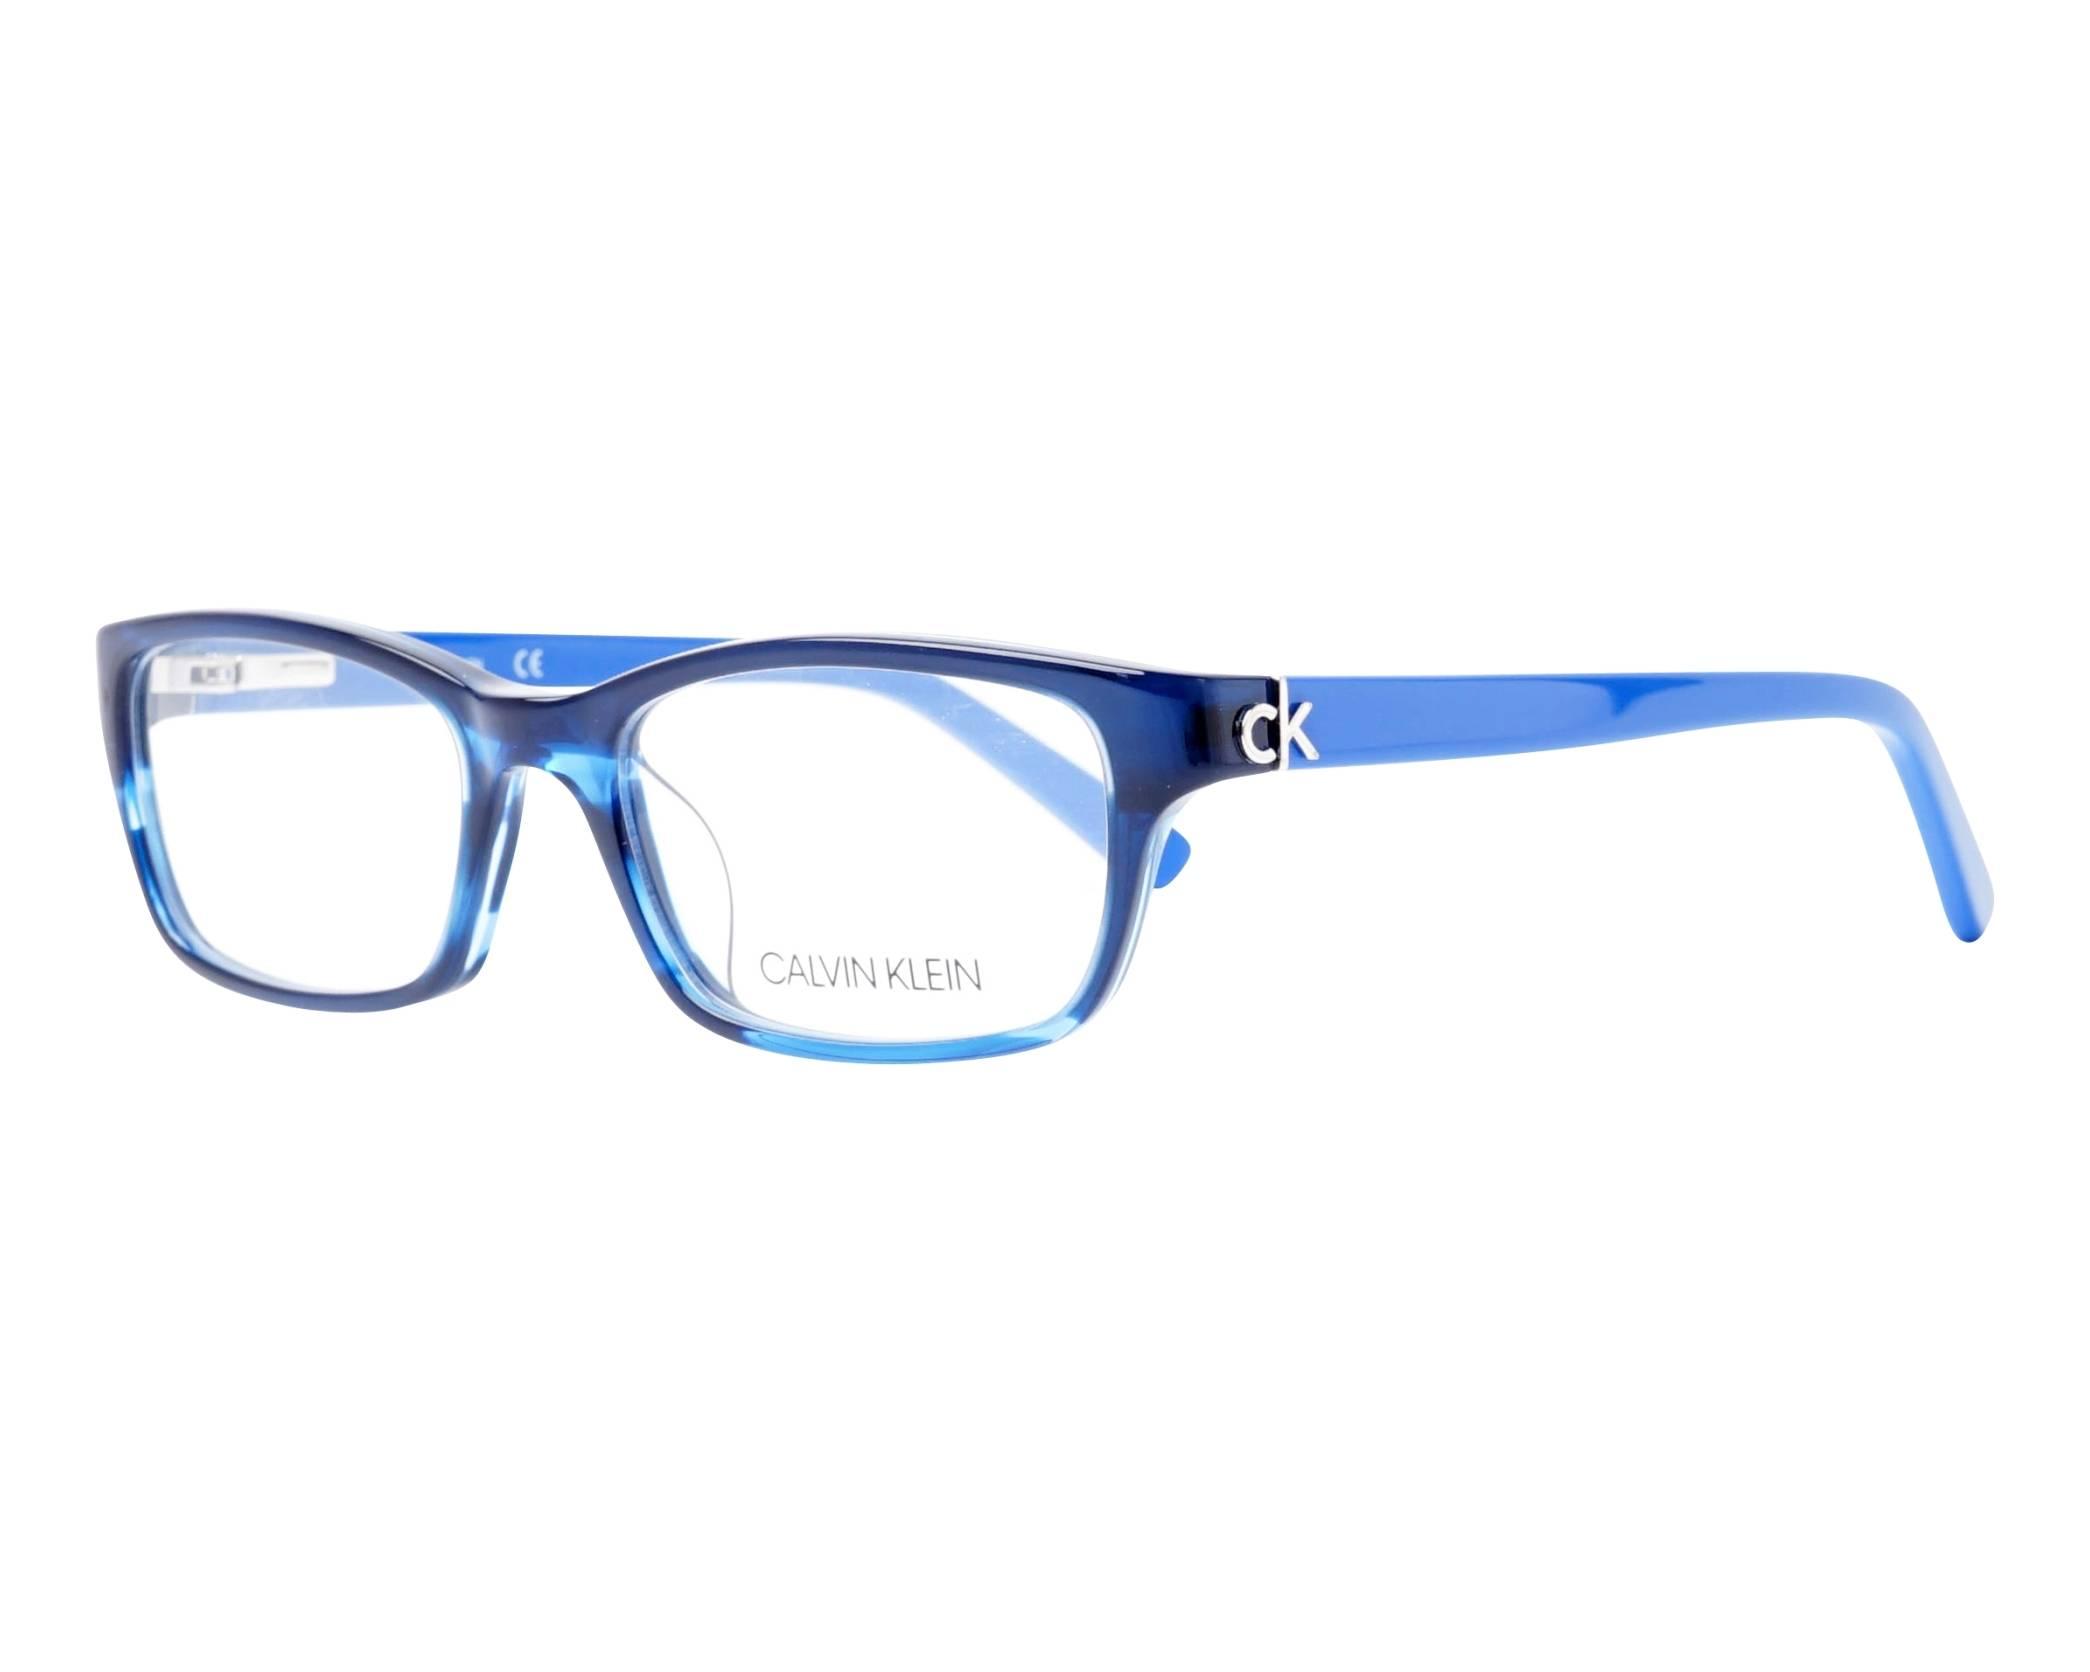 a67514a144 eyeglasses Calvin Klein CK-5691 415 50-17 Blue Blue profile view